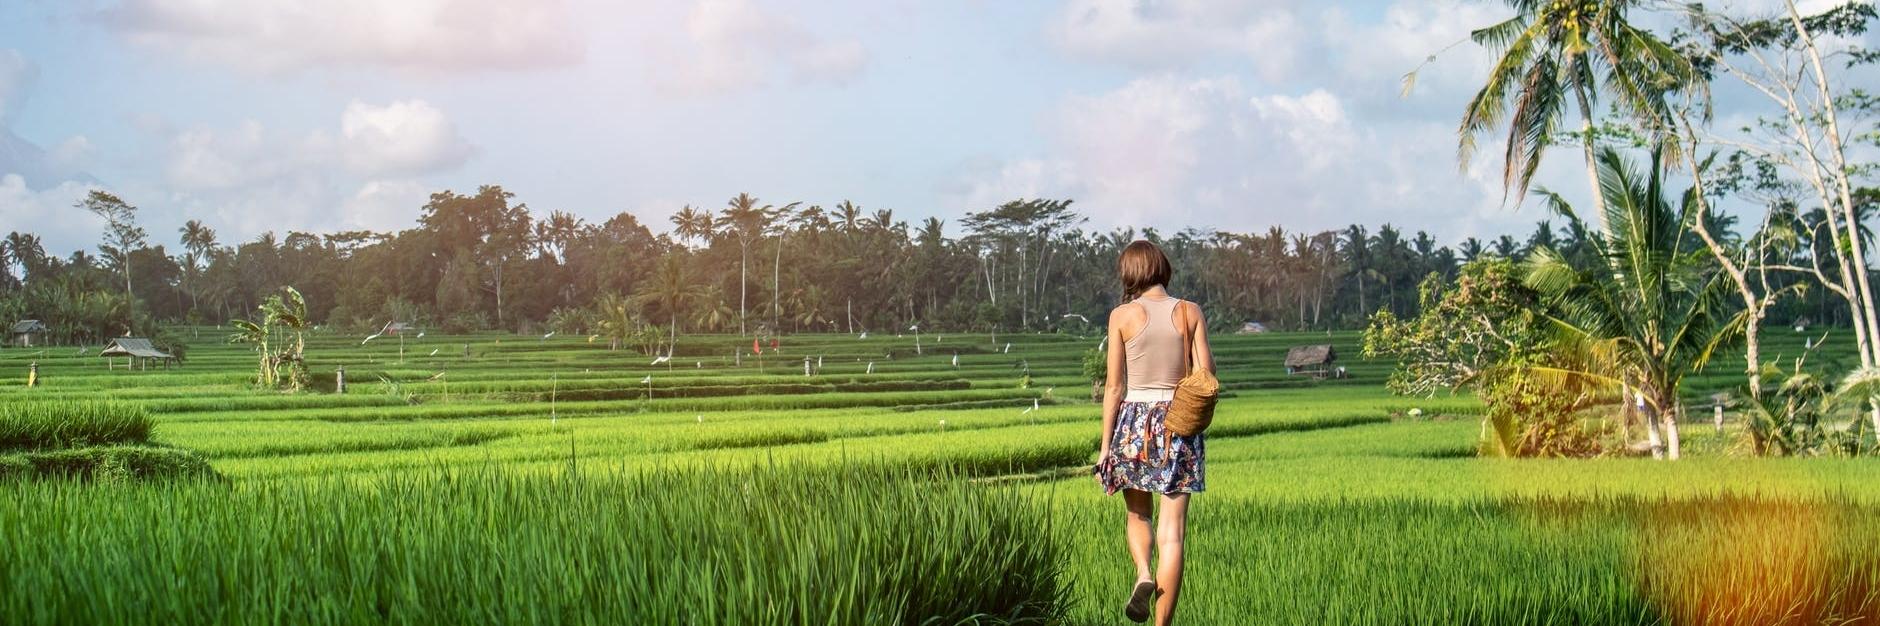 https://gody.vn/blog/nguyentoan05/post/10-diem-den-hap-dan-nhat-chau-a-ma-ban-khong-nen-bo-qua-2011